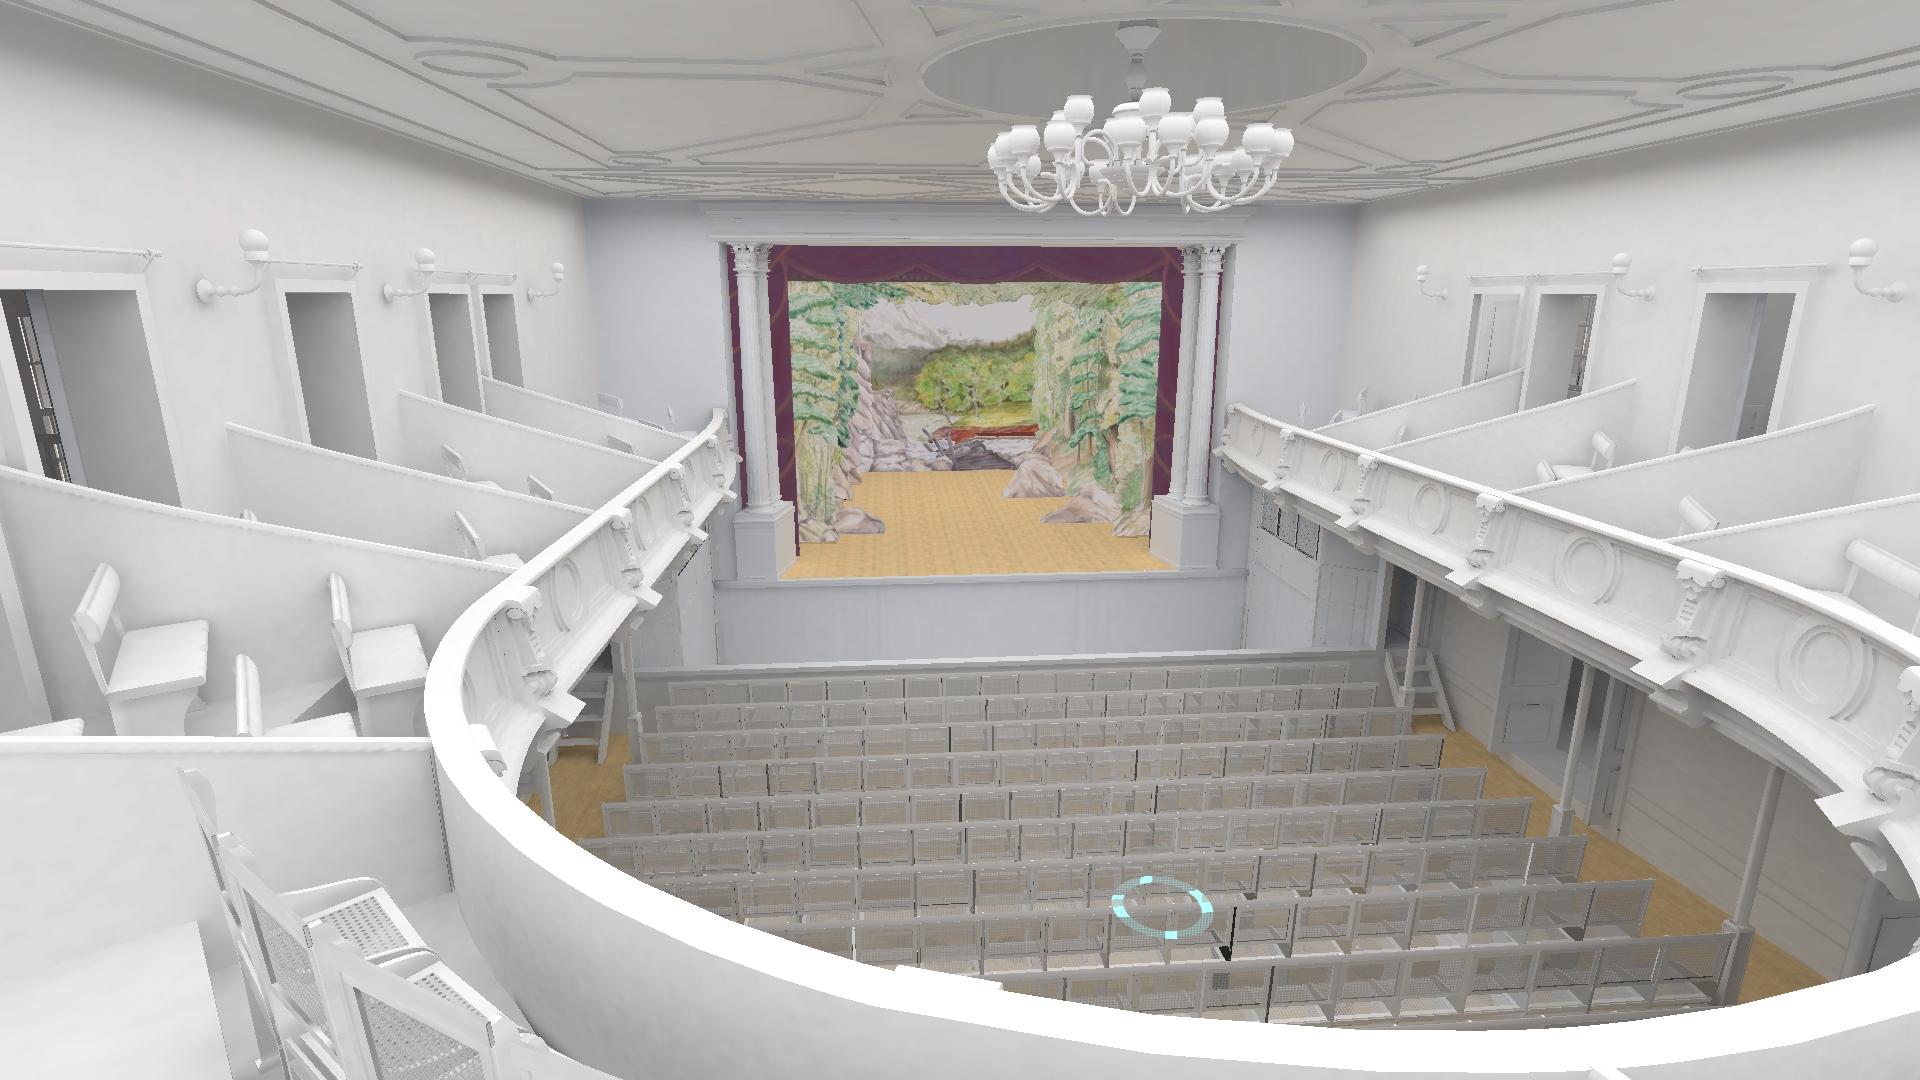 Bergen Theatre with installed scenic art